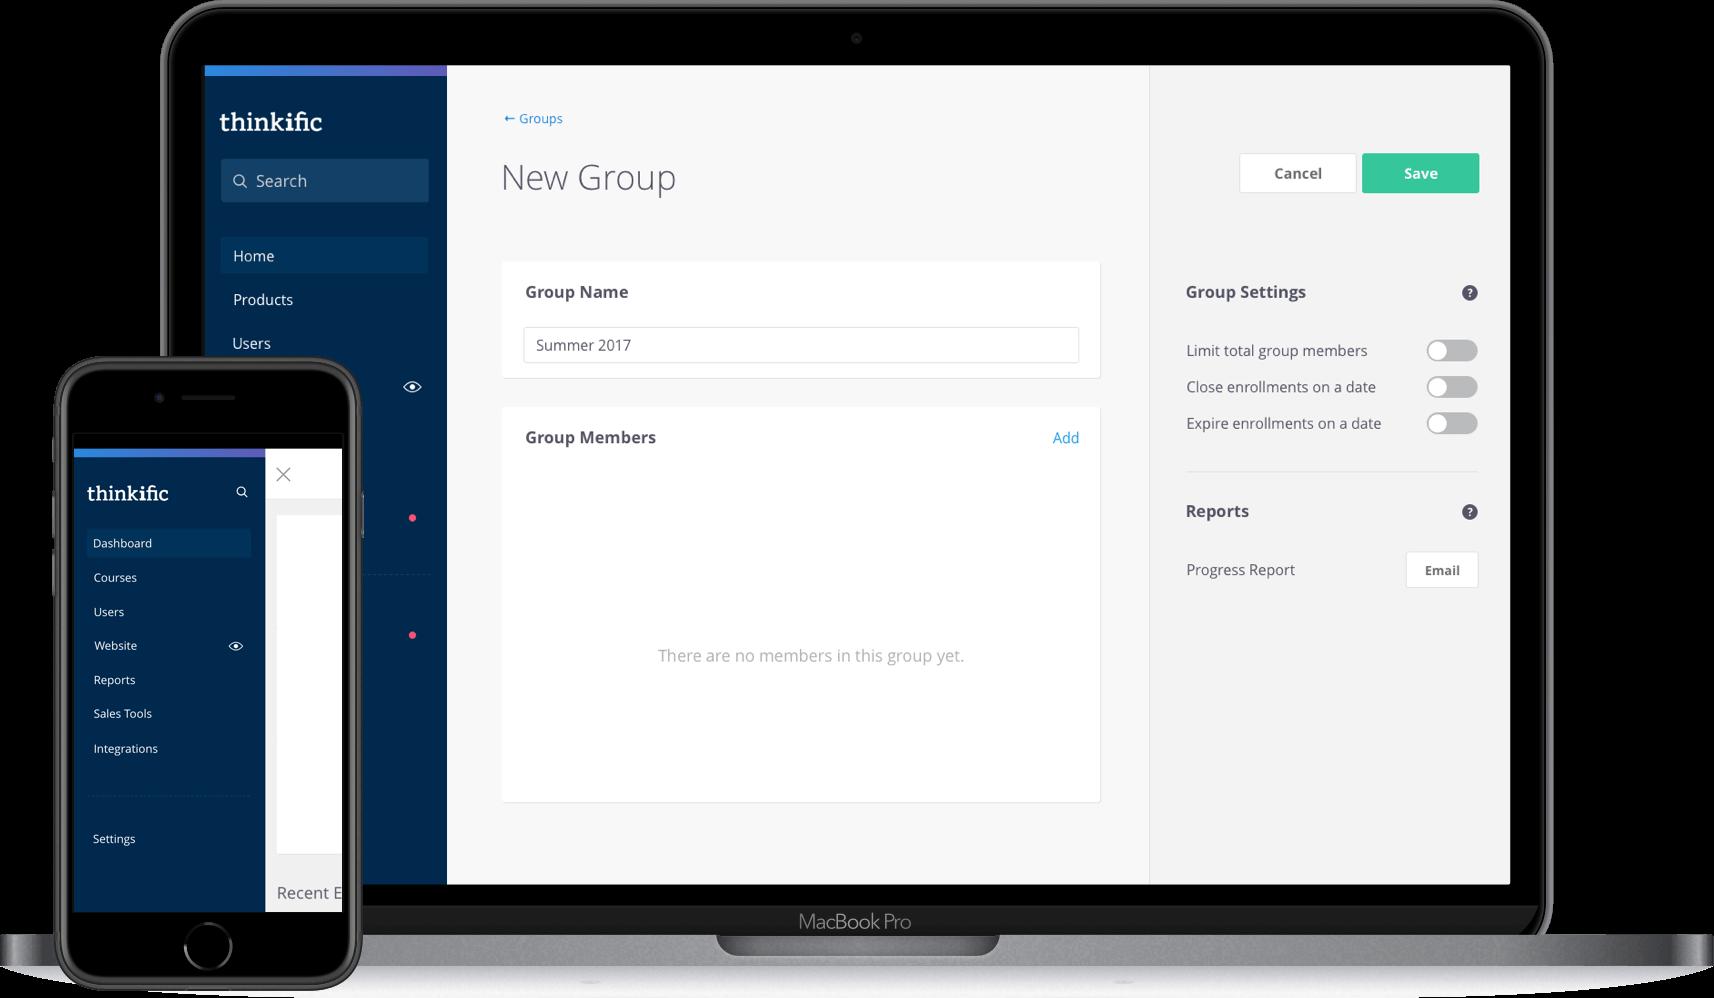 Thinkific app interface example